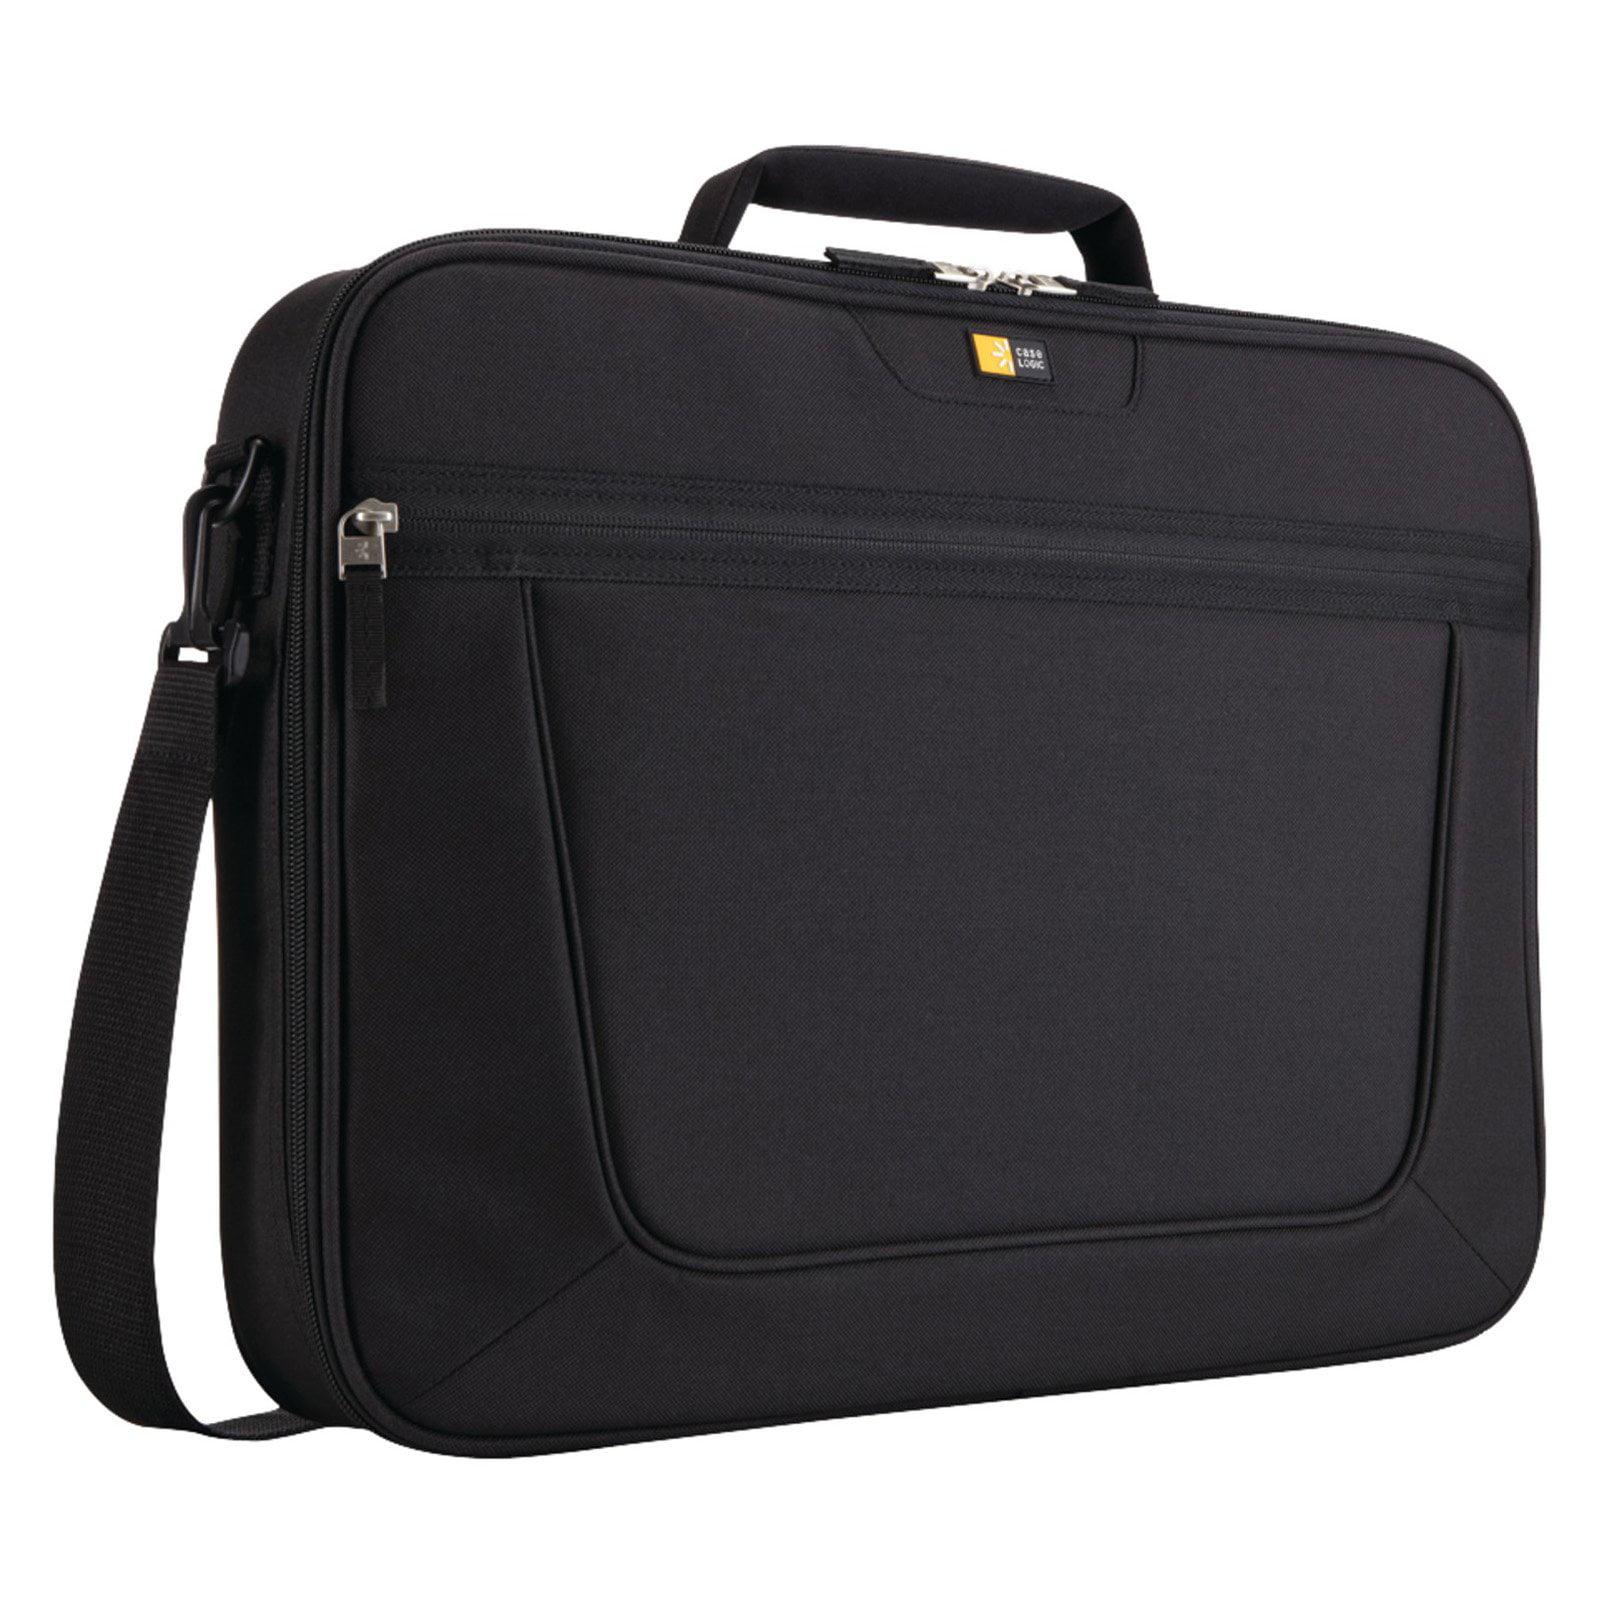 "Case Logic 17.3"" Clamshell Laptop Briefcase, Black"